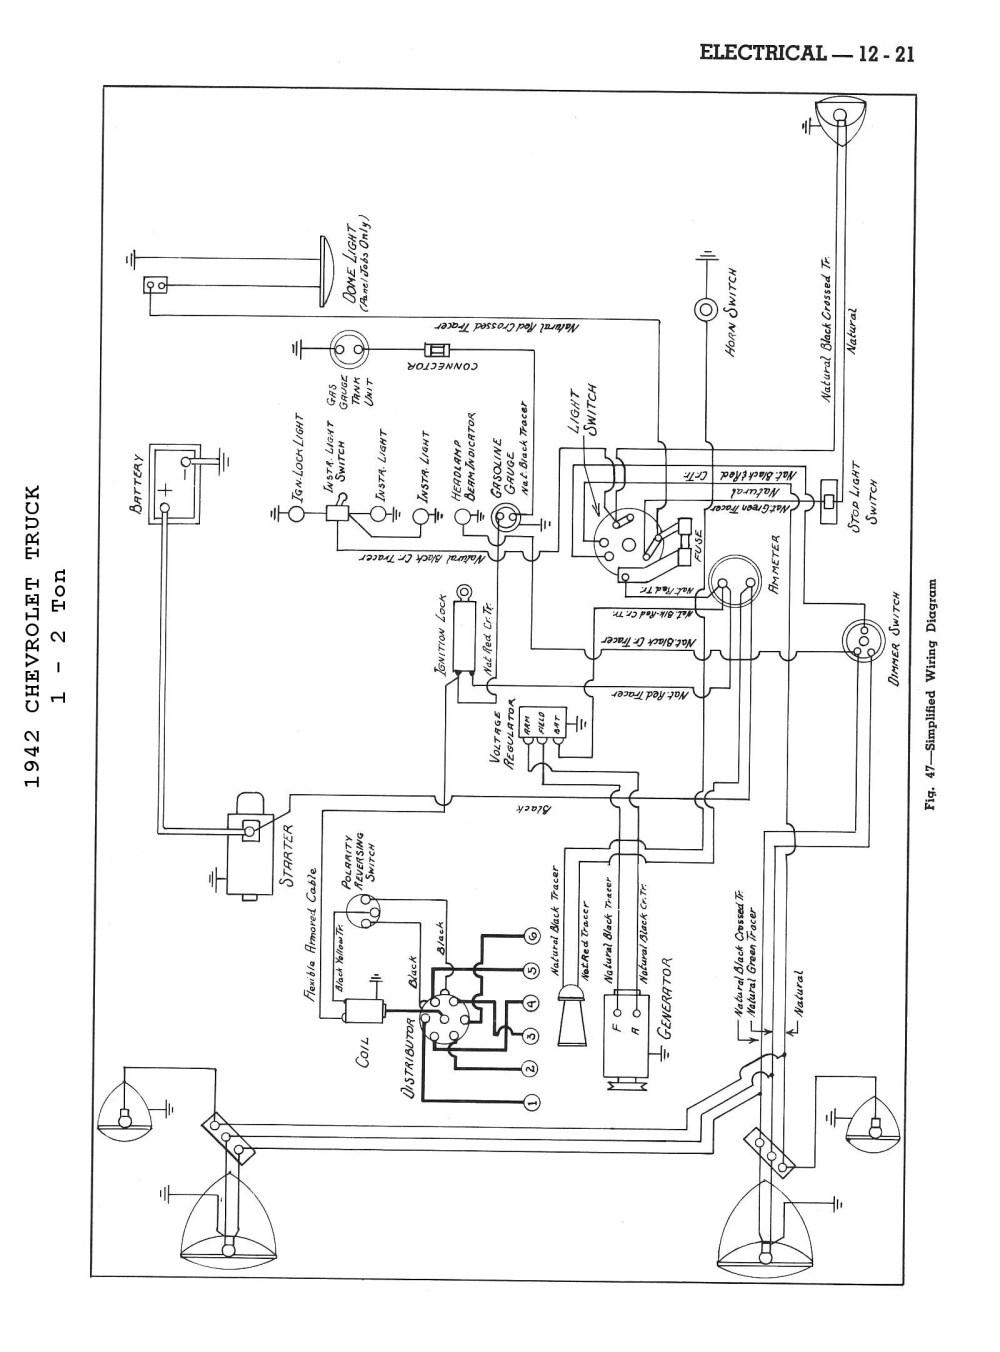 medium resolution of 1957 chevy heater wiring diagram books of wiring diagram u2022 57 chevy dash wiring diagram